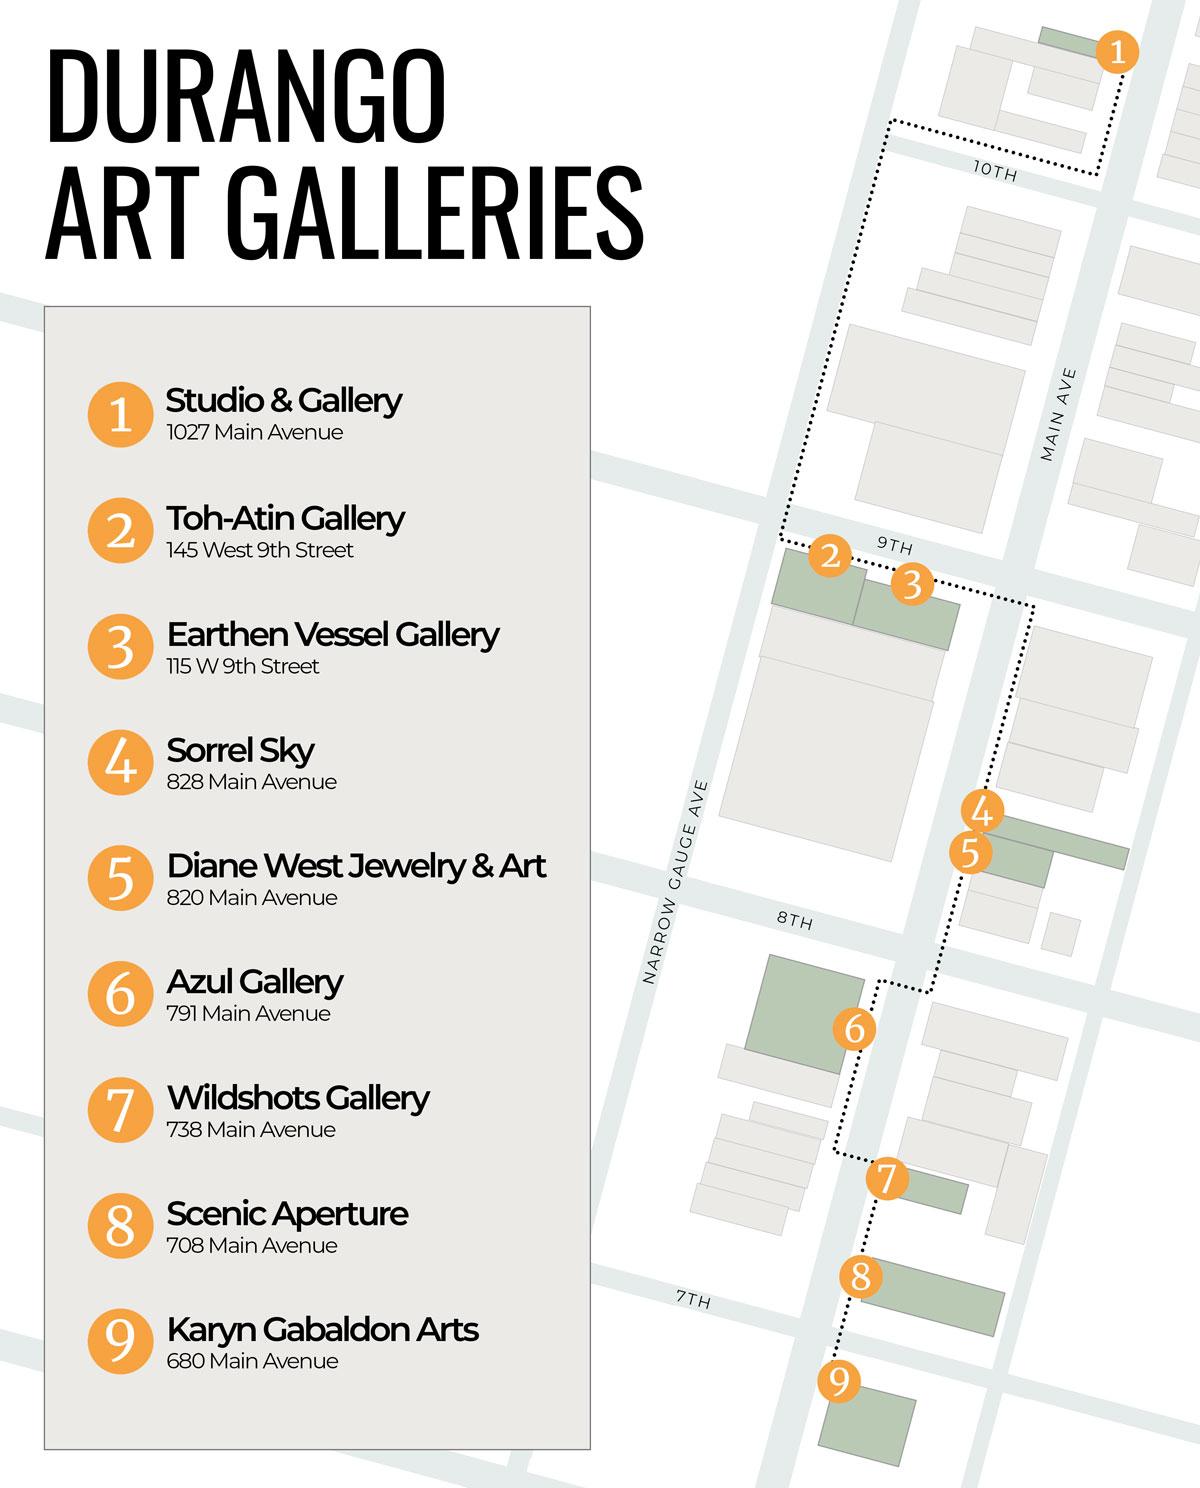 Map of Durango art galleries